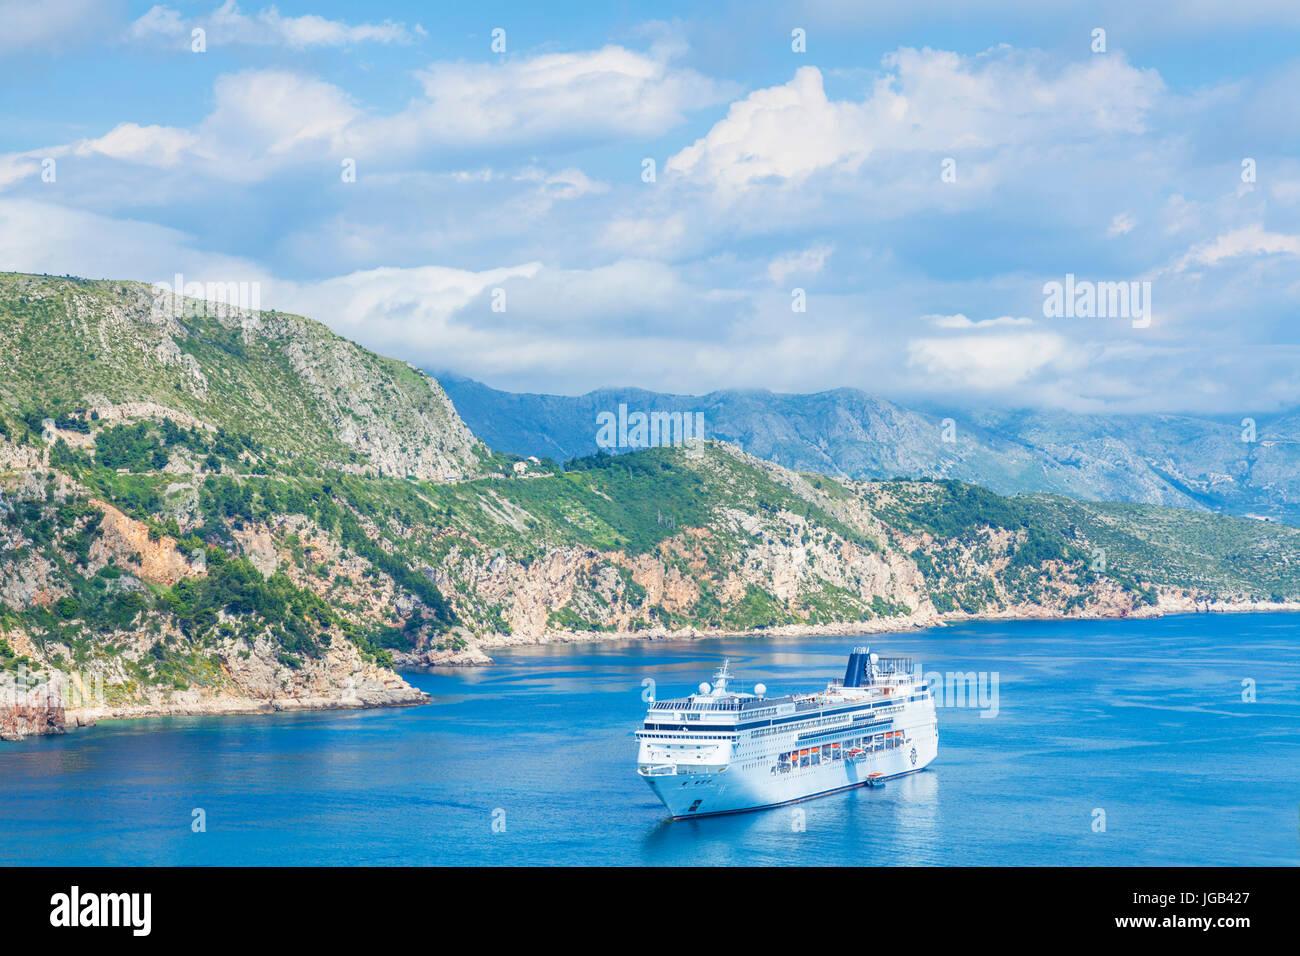 Croatia Dubrovnik Croatia Dalmatian coast cruise ship sailing down the dalmatian coastline towards dubrovnik adriatic - Stock Image